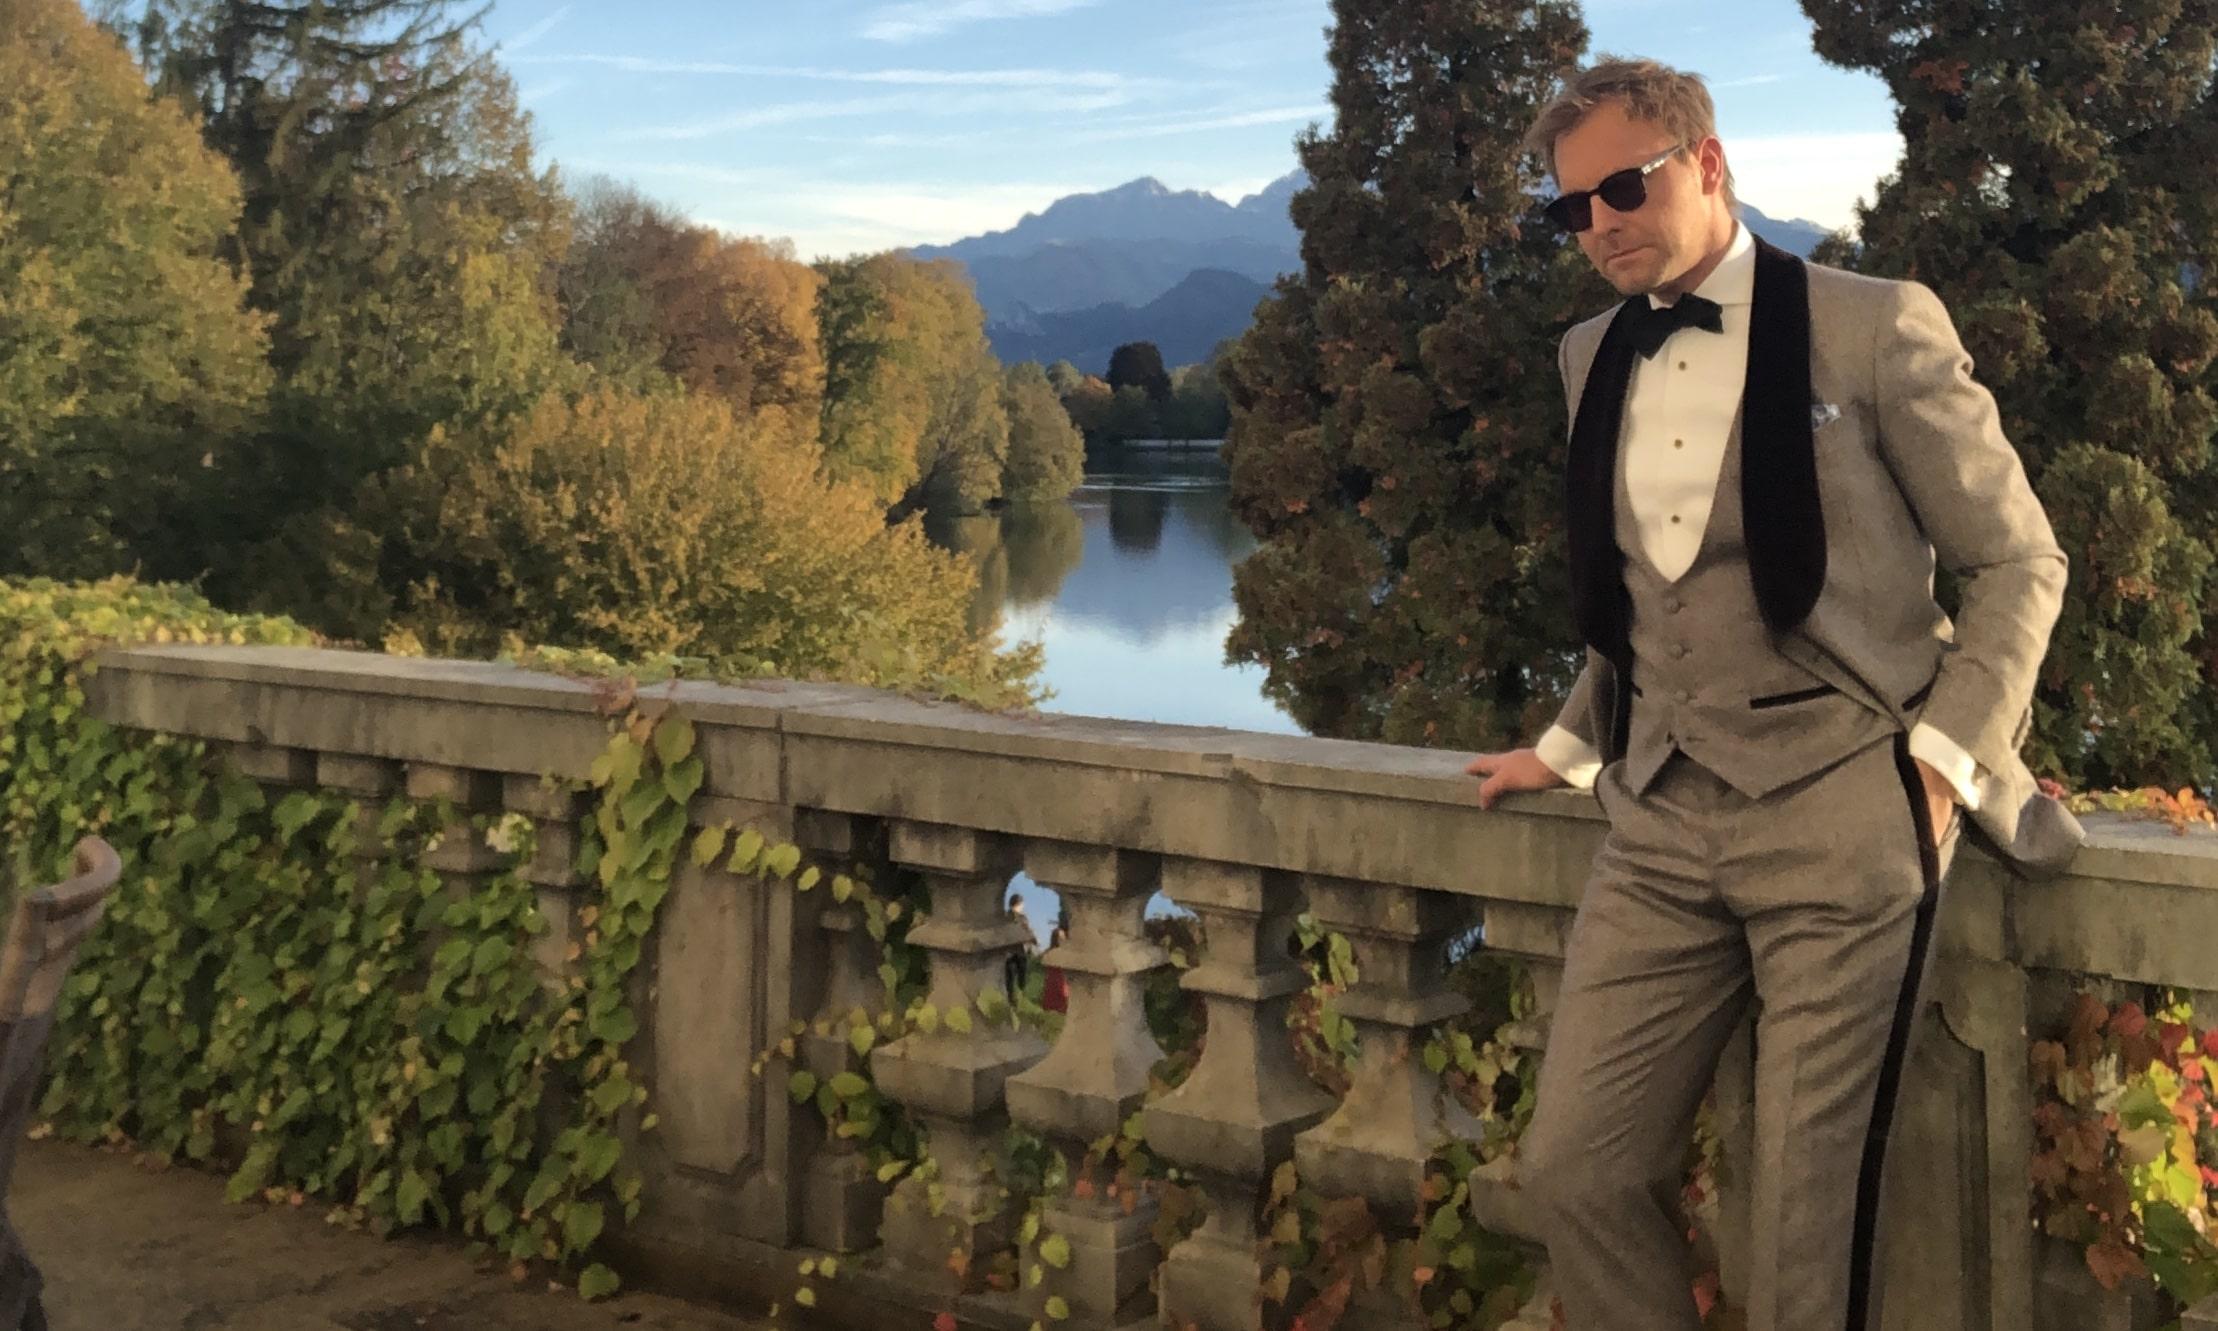 Hochzeits-DJ Oskar – gesehen bei frauimmer-herrewig.de